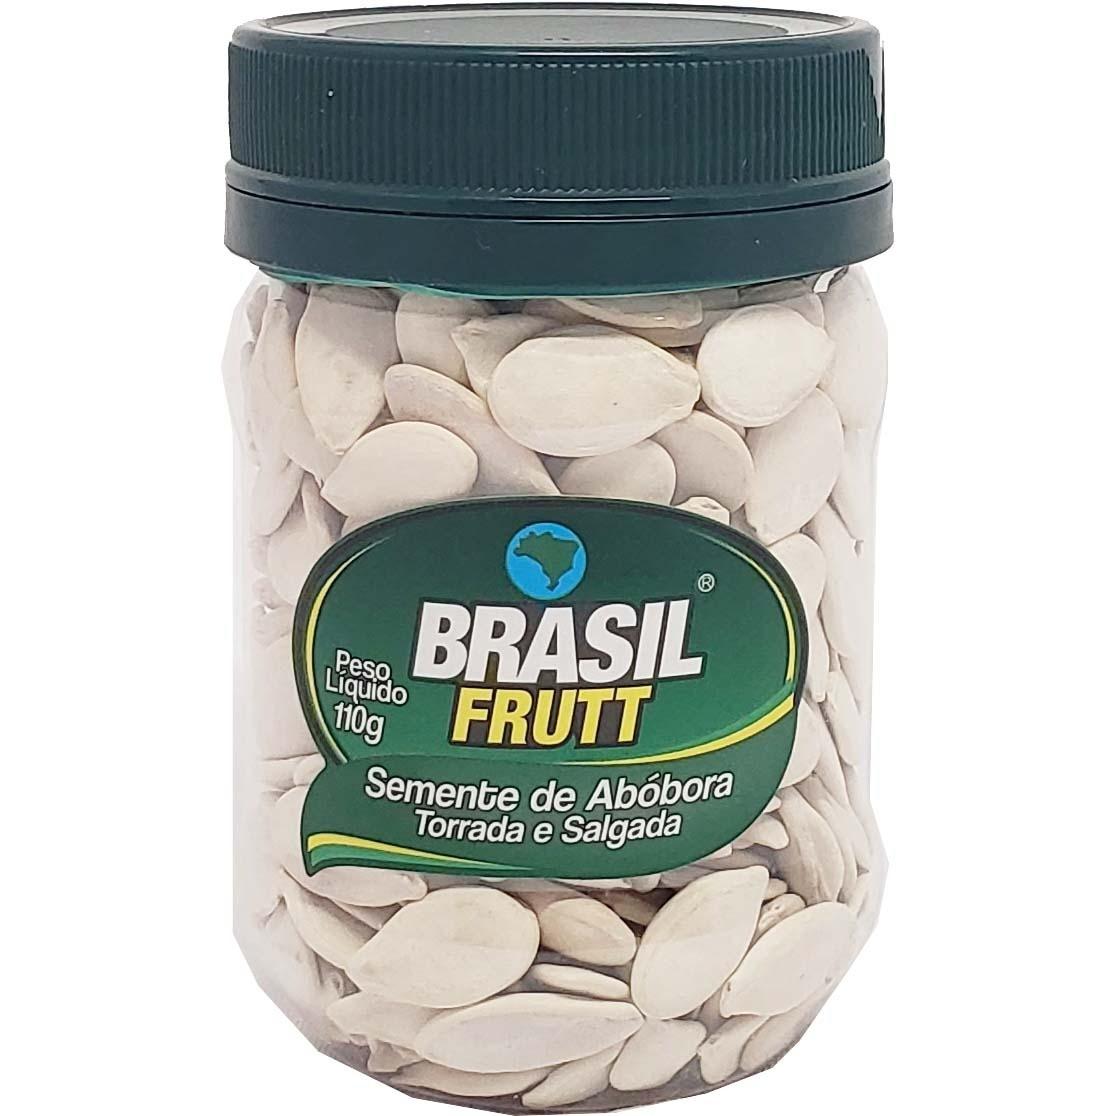 Semente de Abóbora Brasil Frutt - 110g -